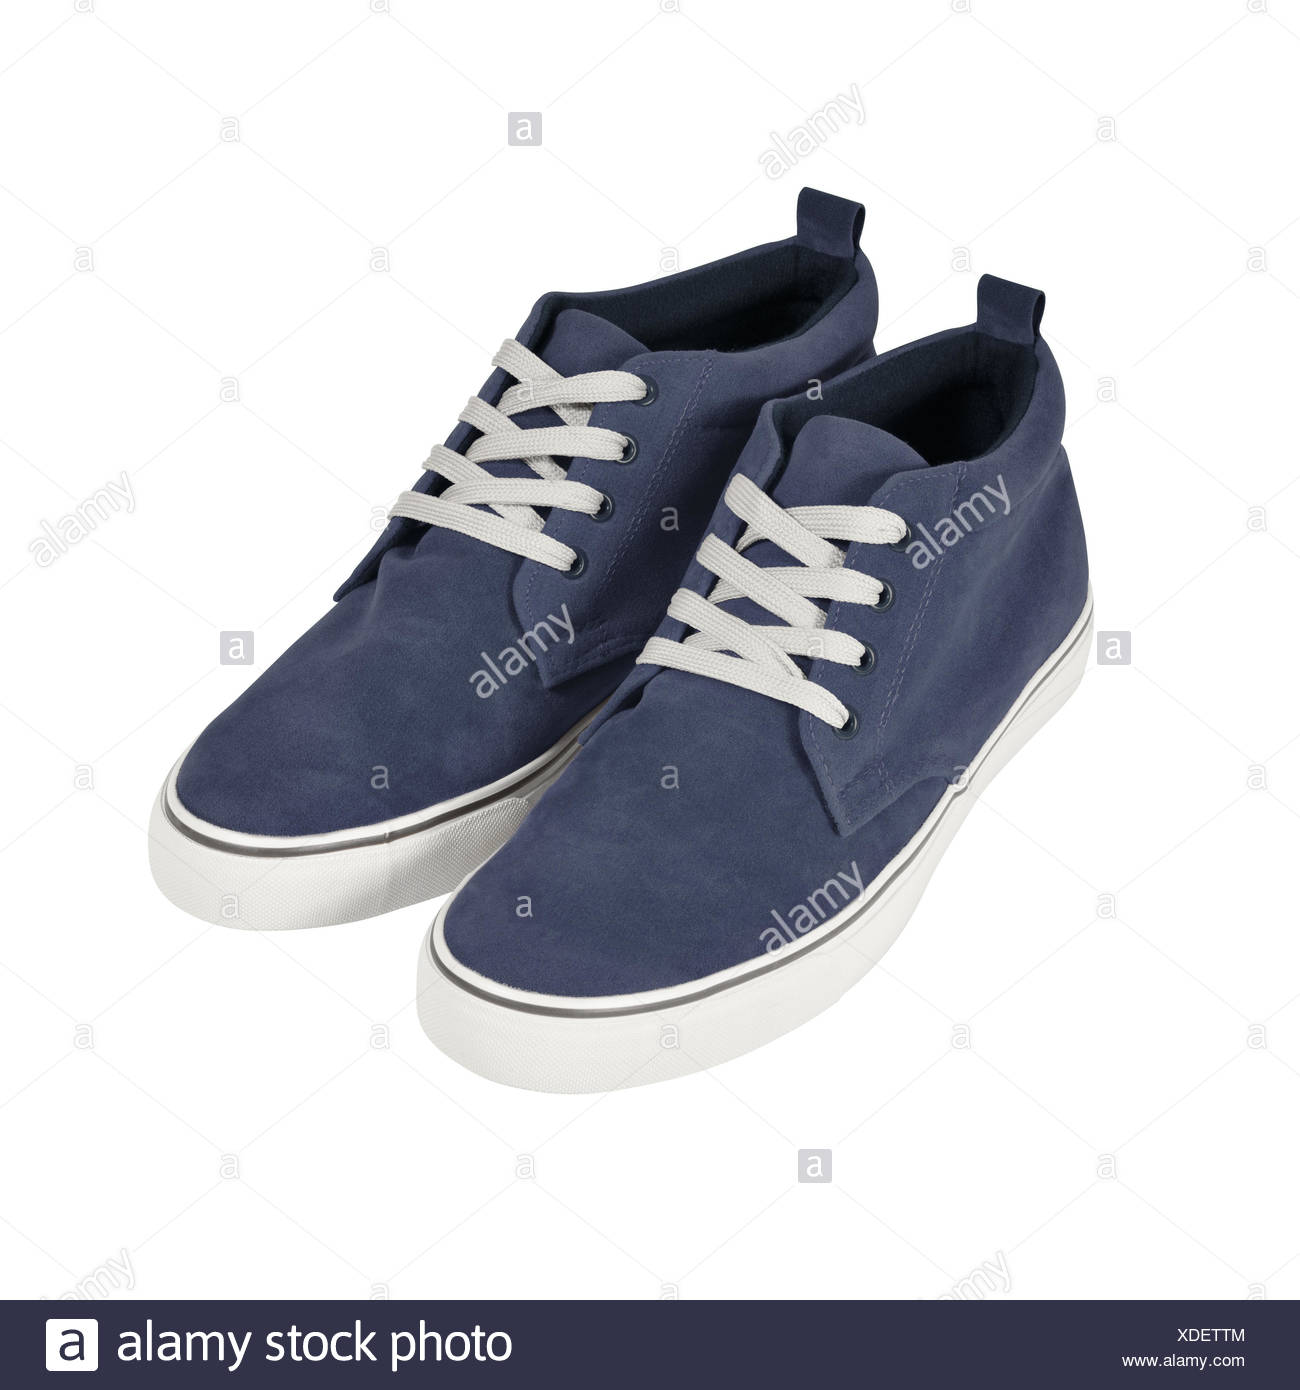 gym shoes stockfotos gym shoes bilder alamy. Black Bedroom Furniture Sets. Home Design Ideas